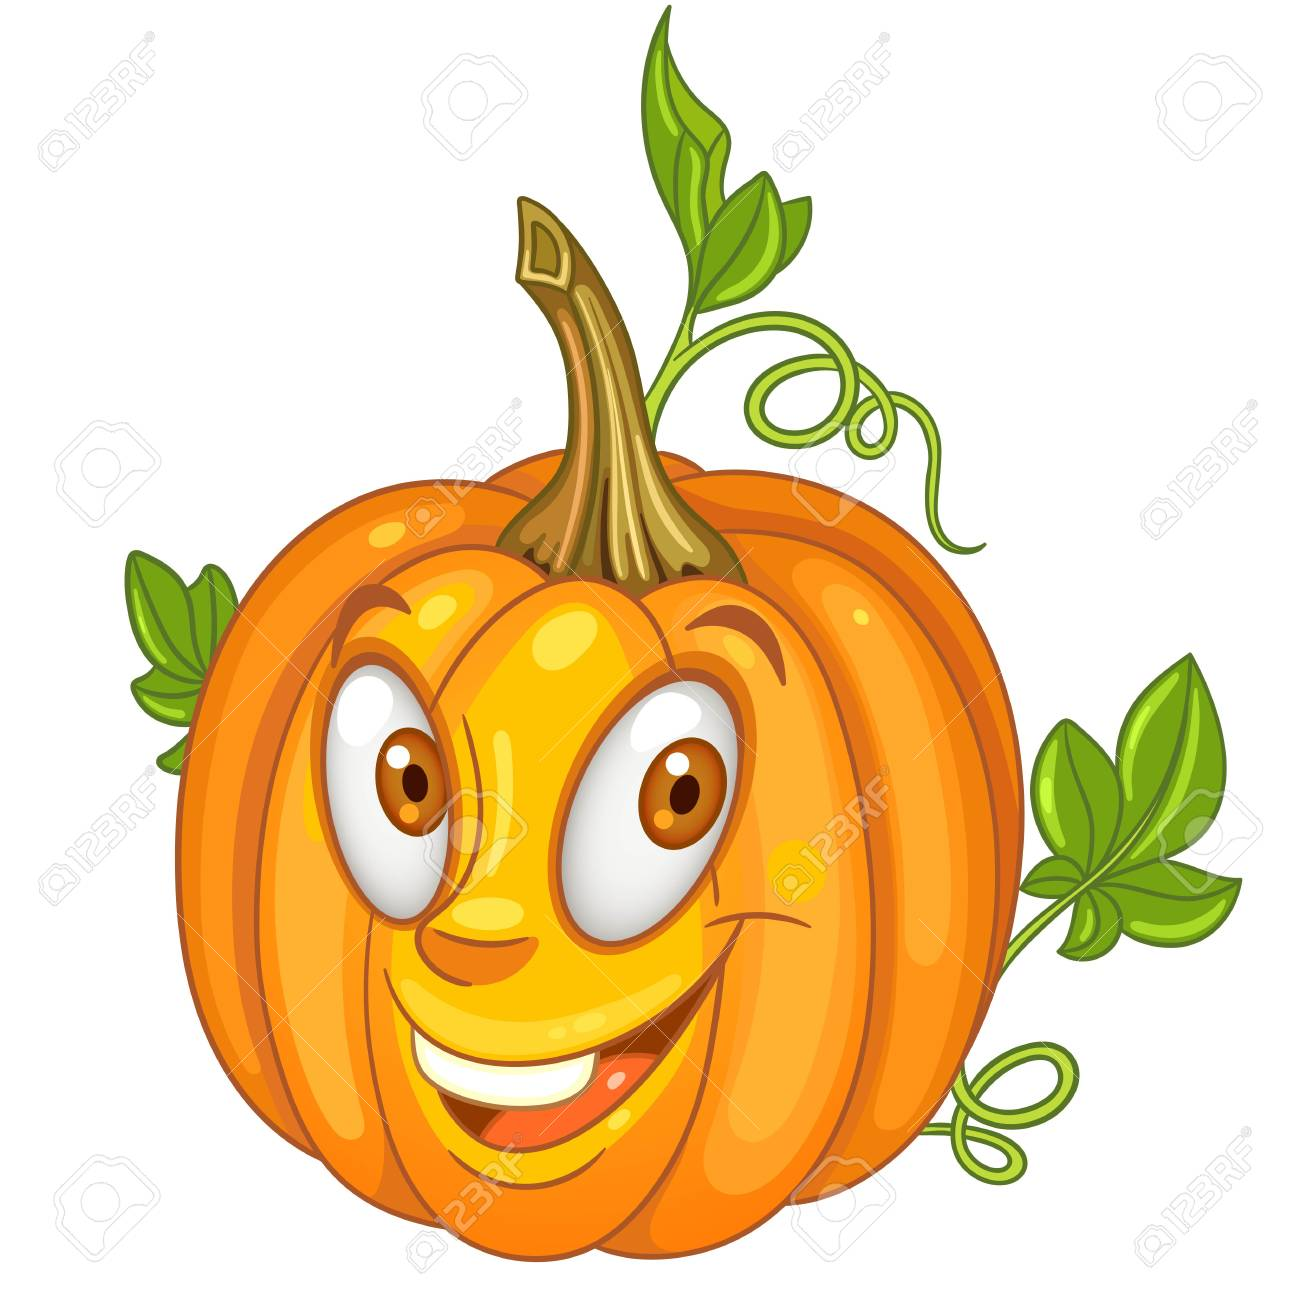 Cartoon pumpkin character happy vegetable symbol eco food icon cartoon pumpkin character happy vegetable symbol eco food icon halloween holiday celebration decor thecheapjerseys Images